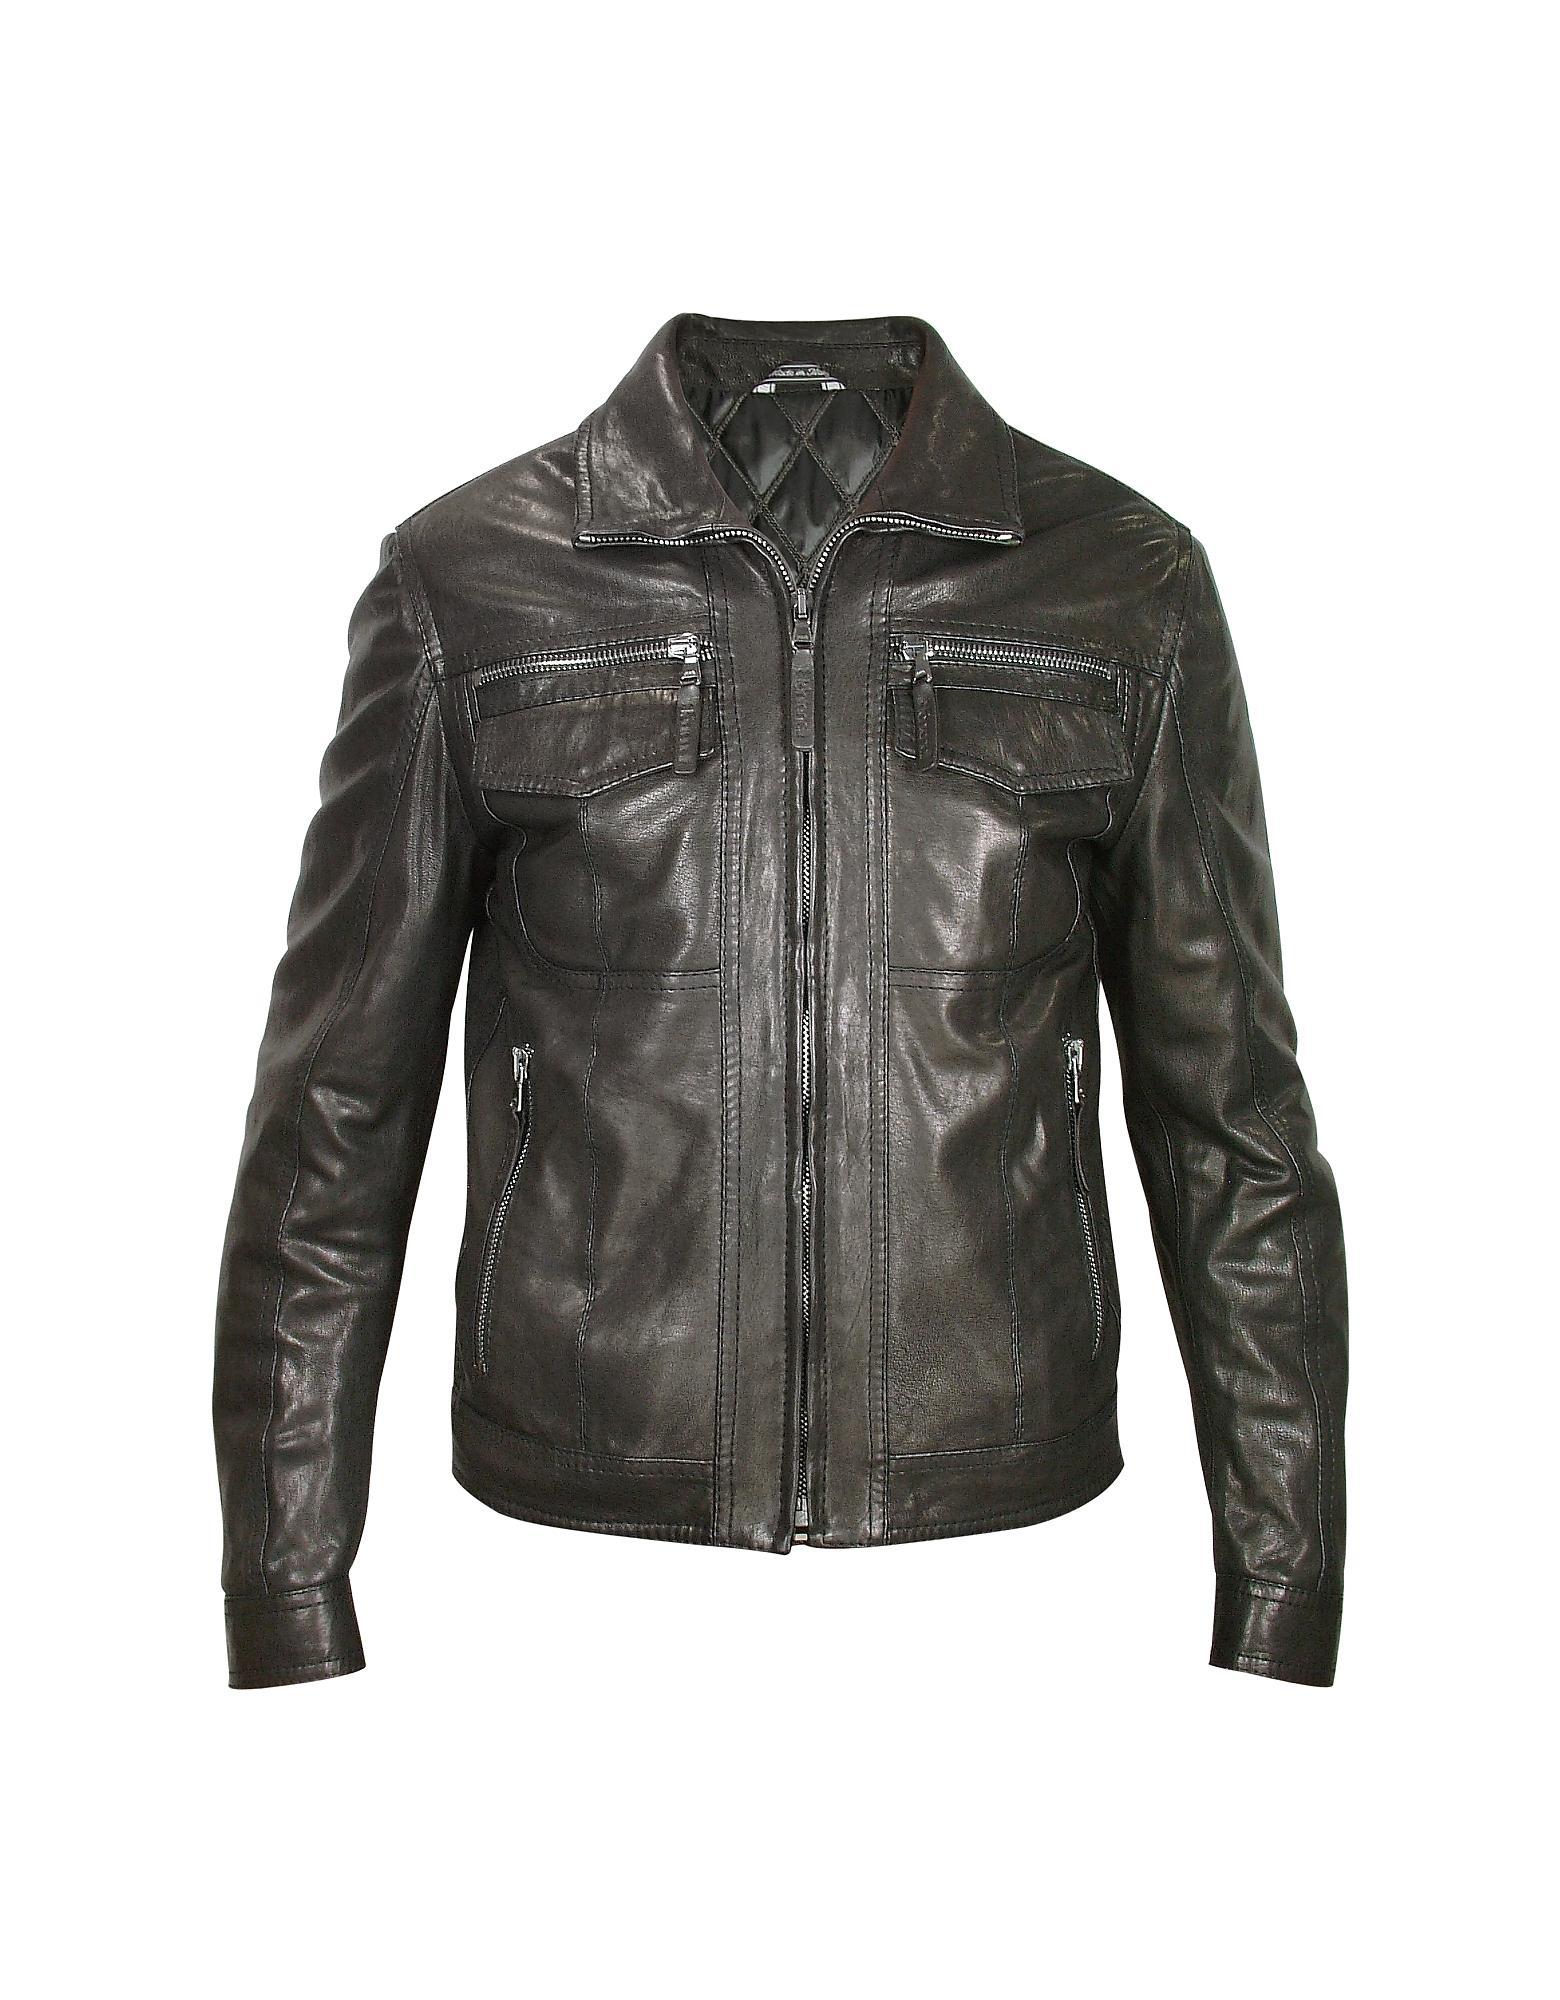 Lyst - Forzieri Men's Black Genuine Leather Motorcycle ...